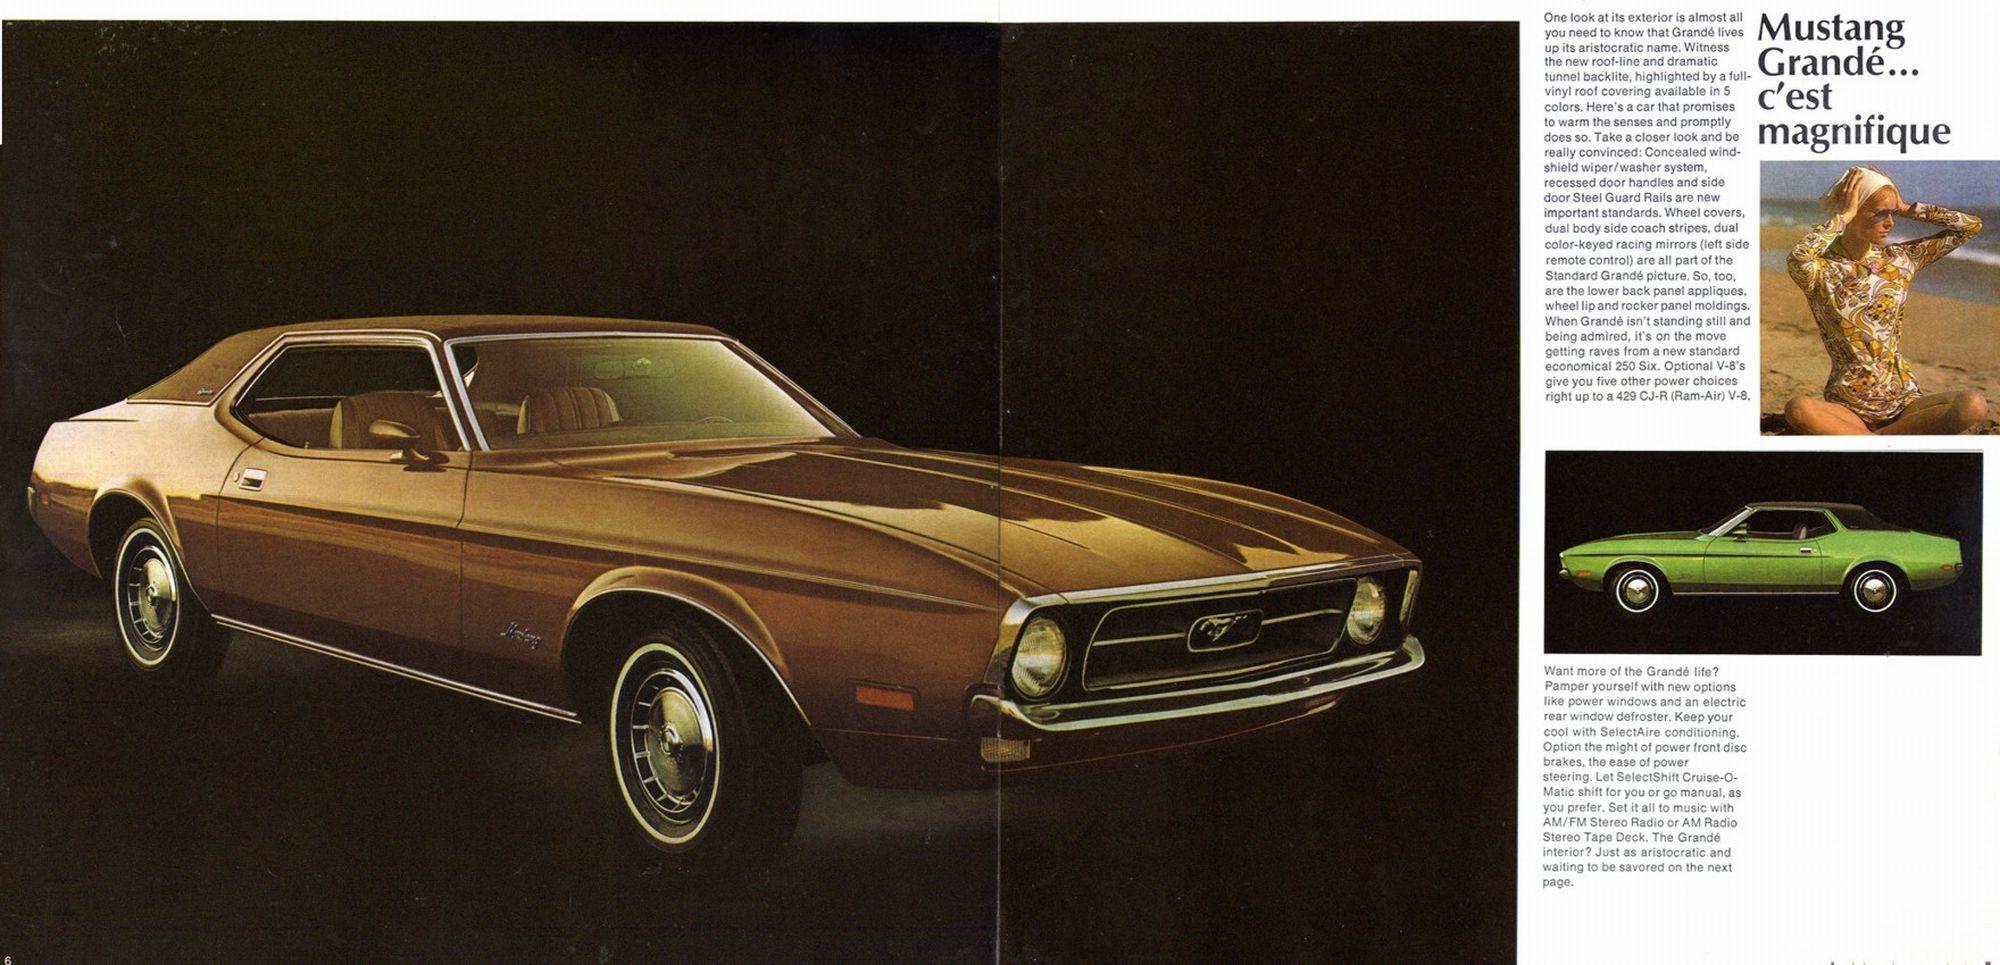 1971 Mustang-06-07